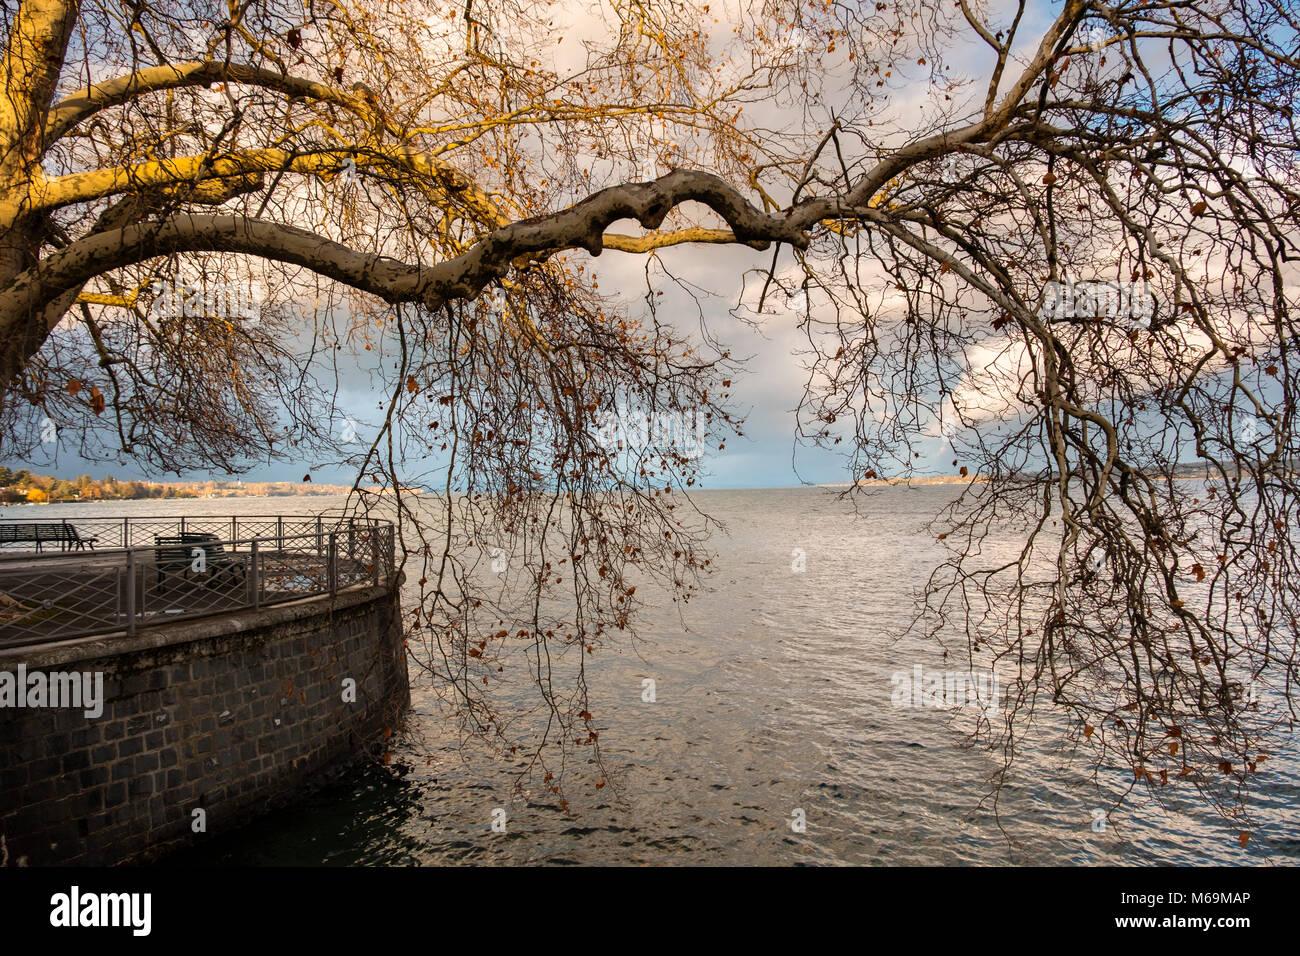 Leman Lake. Old town, historic center. Genève Suisse. Geneva. Switzerland Europe - Stock Image